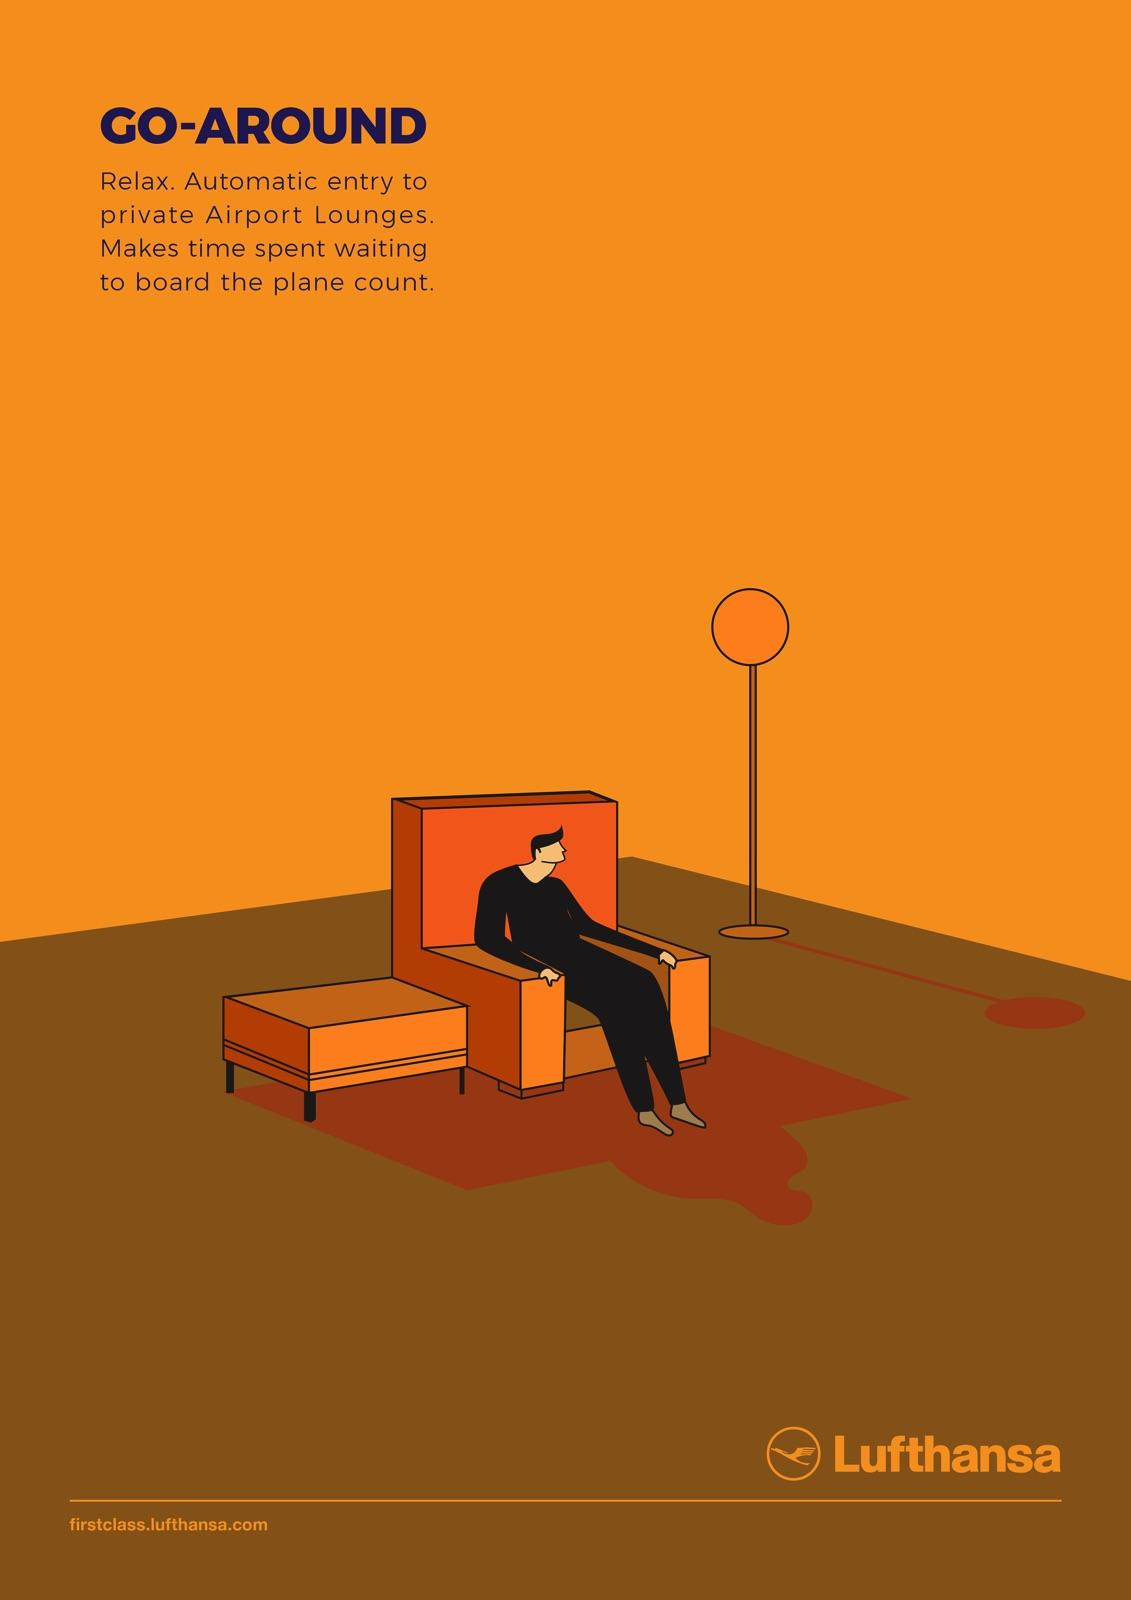 Lufthansa Print Ad - First Class Travel - Go-Around